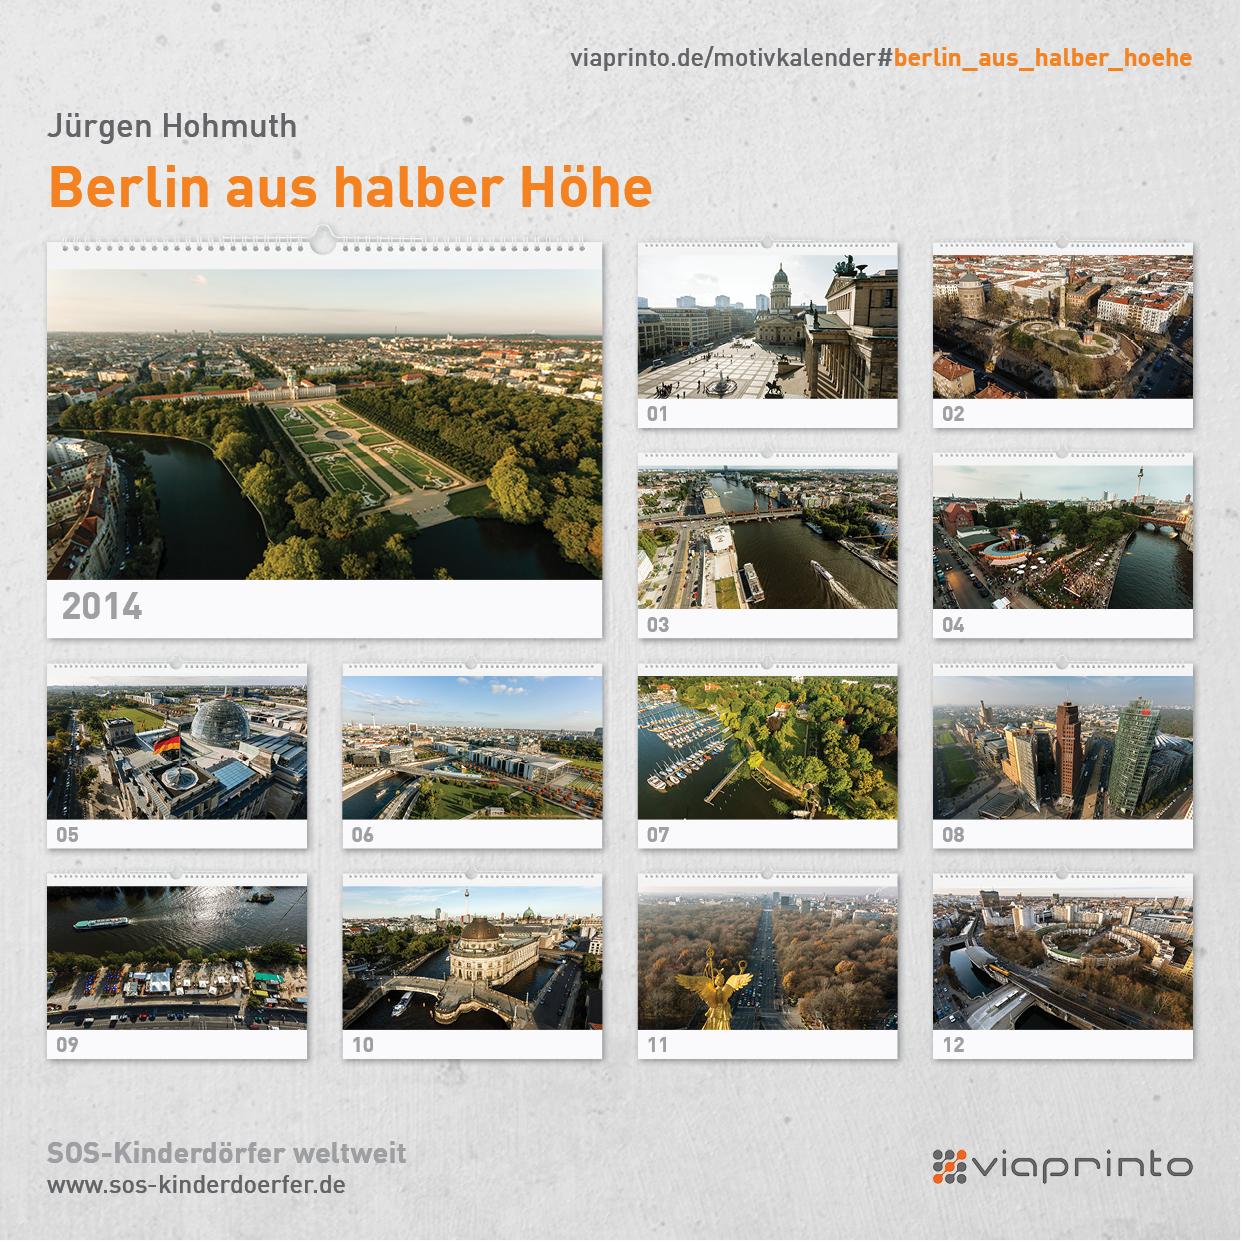 https://www.viaprinto.de/motivkalender#/berlin_aus_halber_hoehe